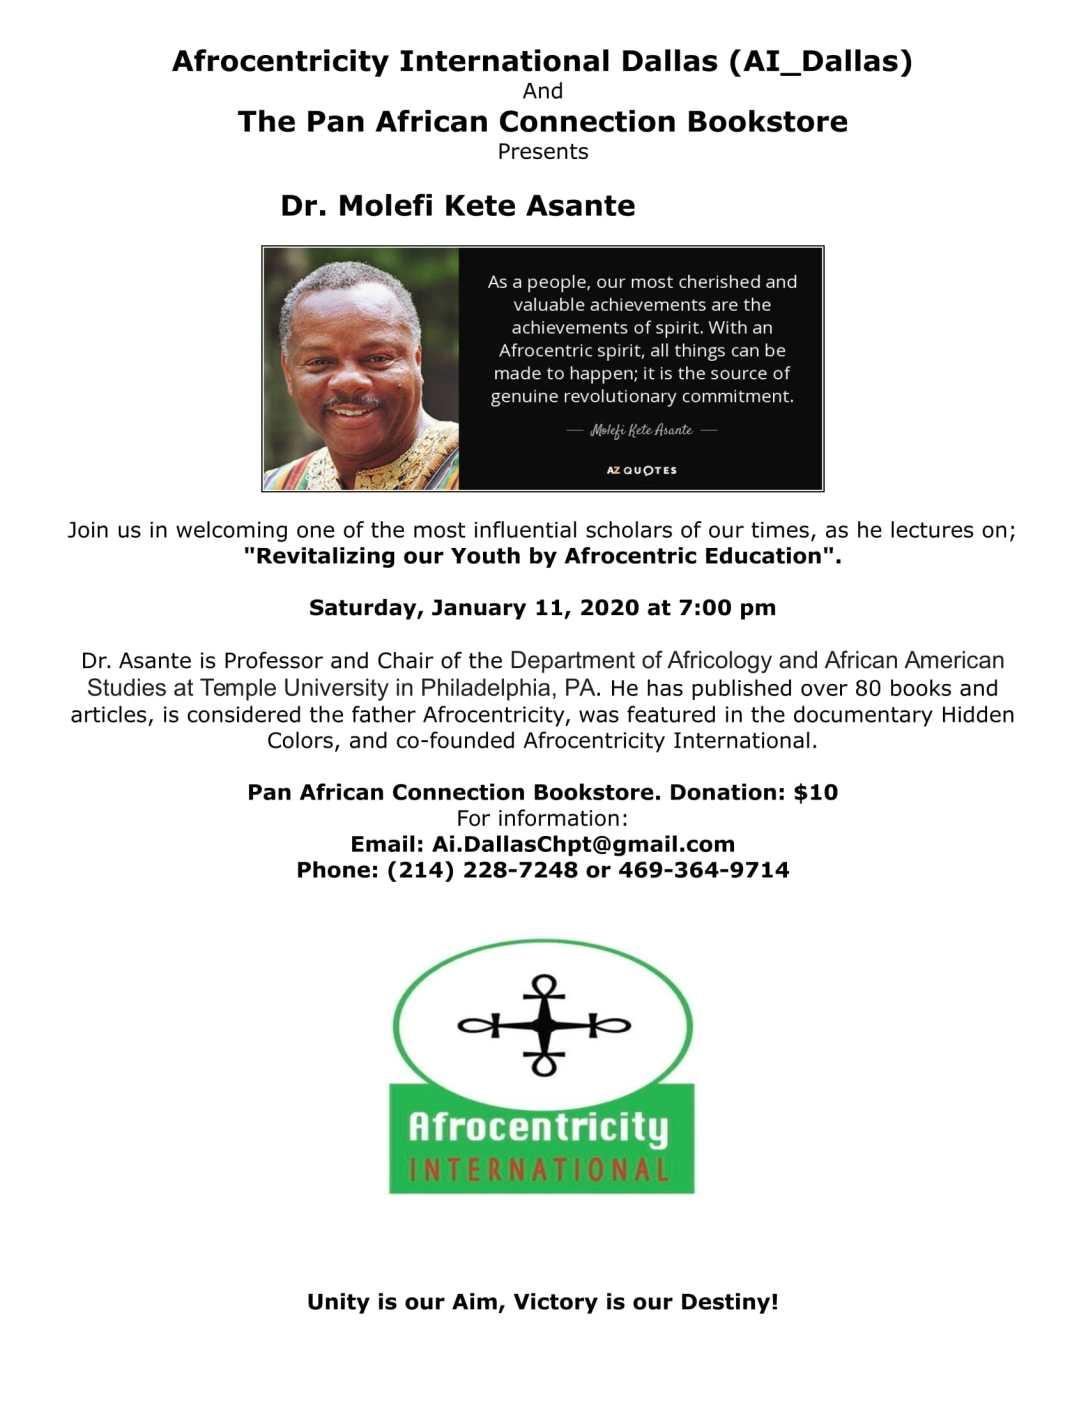 AI Dallas Presents Dr Molefi Ashante FLYER revised-1